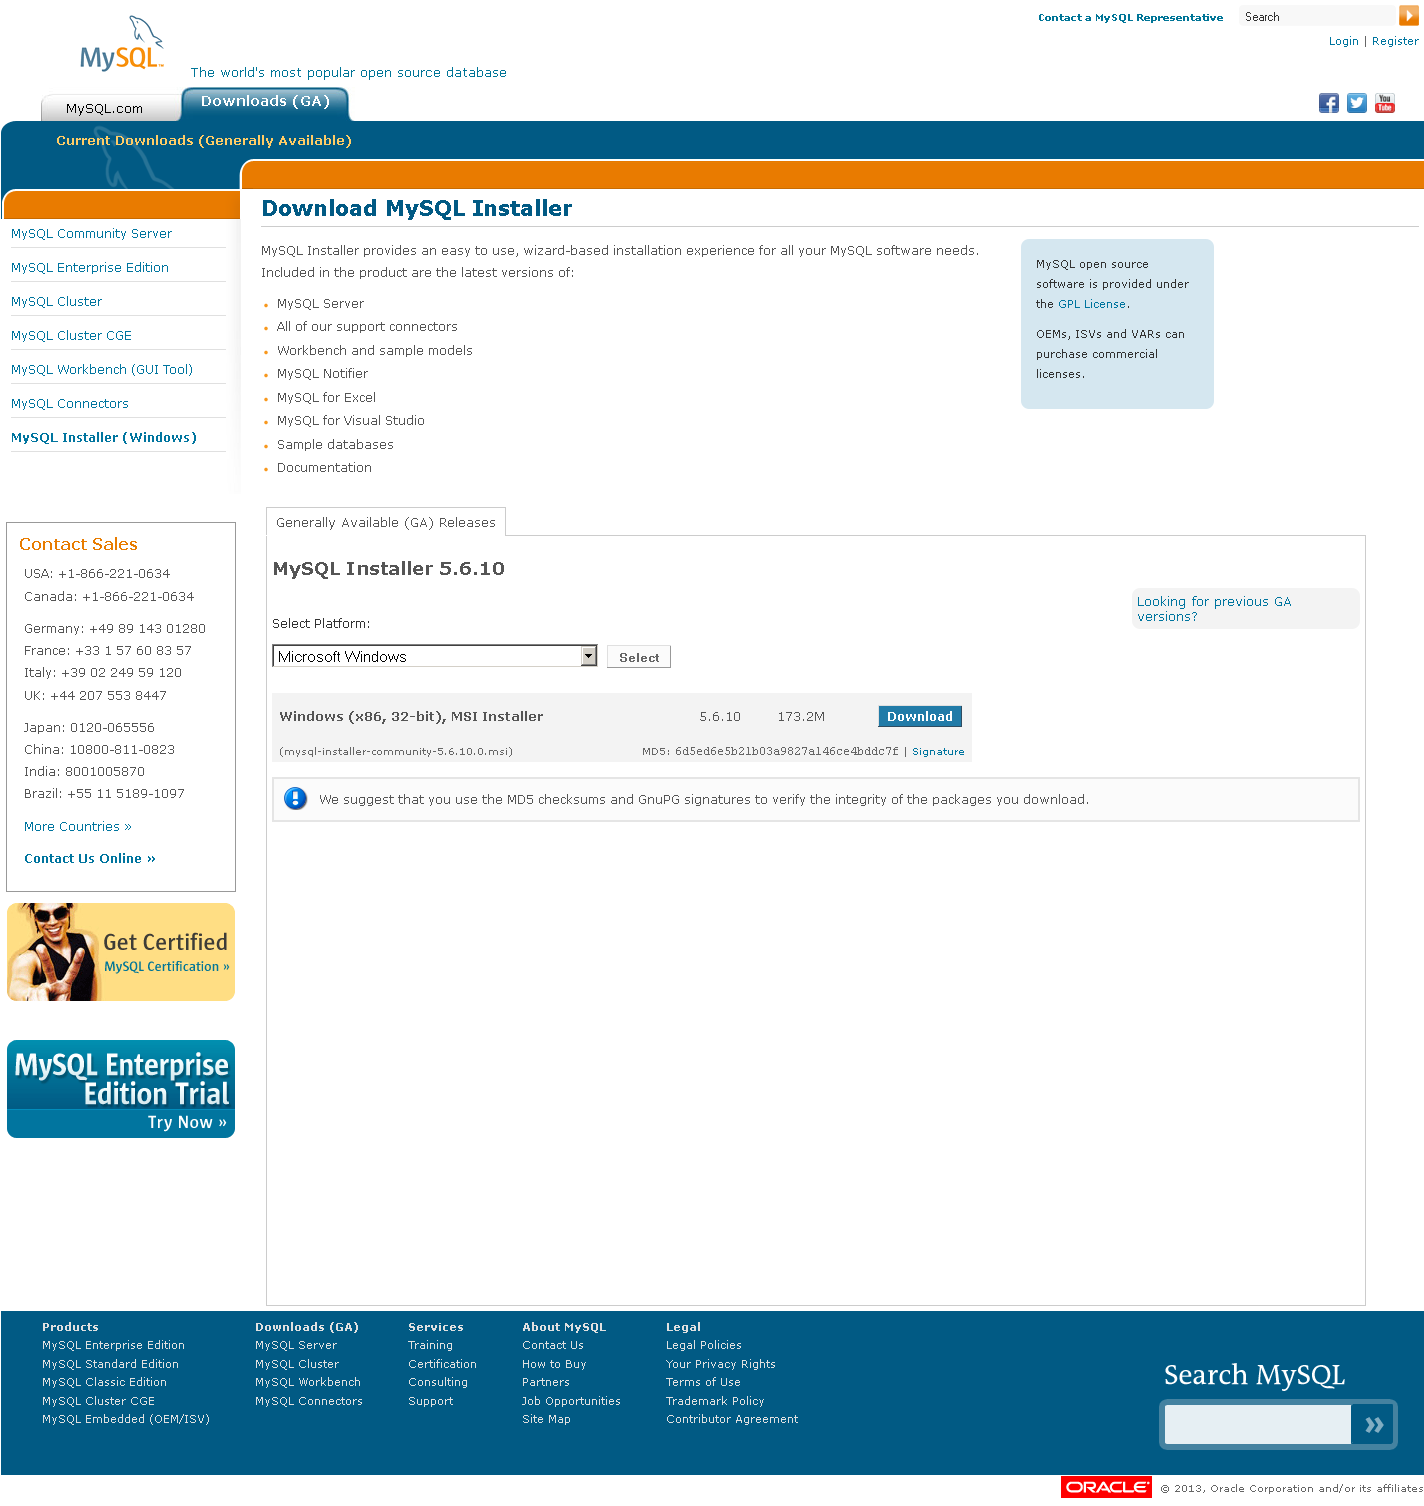 MySQL Installer page